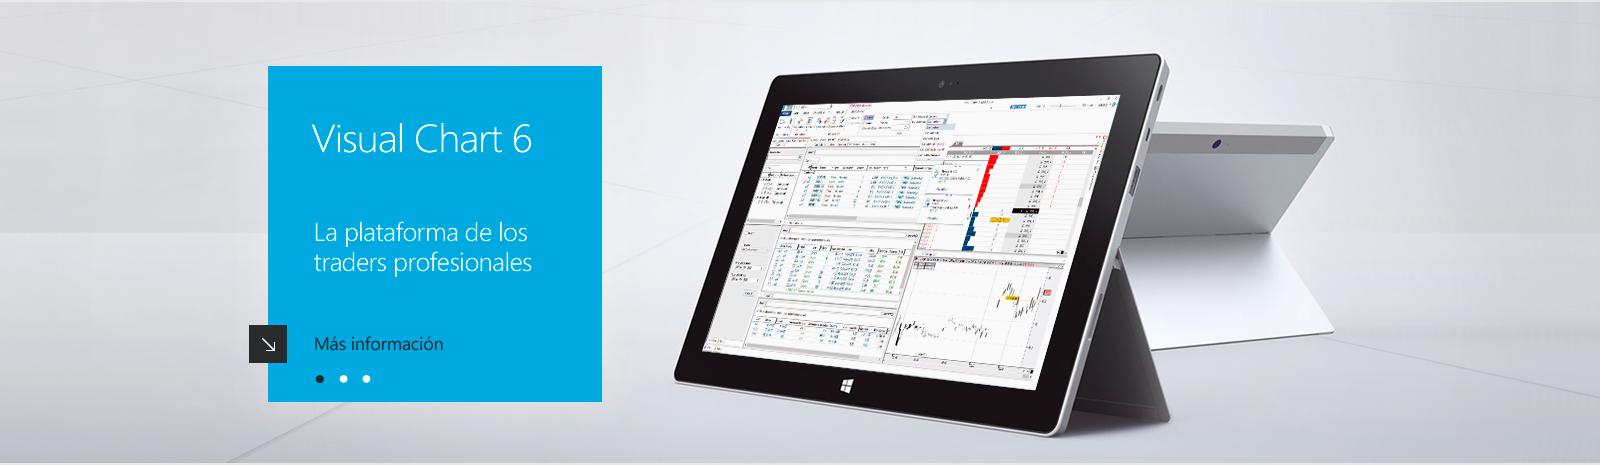 Visual Chart Software de trading y análisis técnico